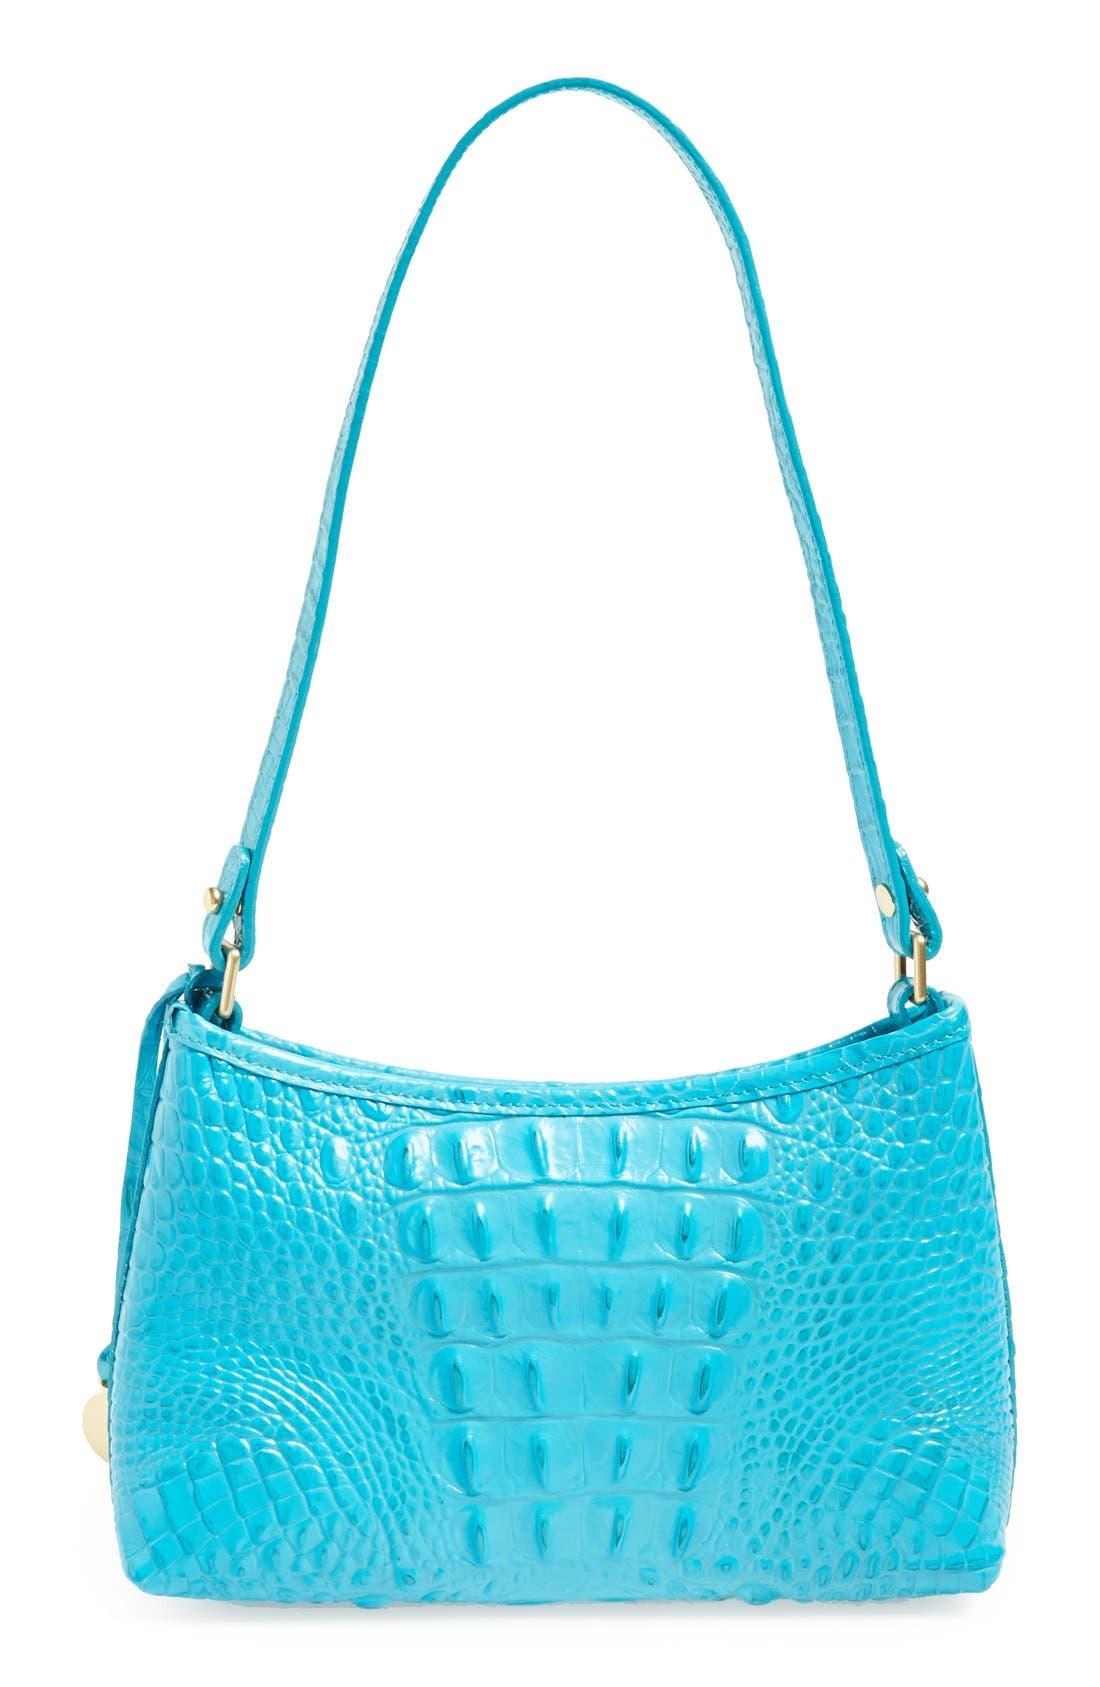 'Anytime - Mini' Convertible Handbag,                             Alternate thumbnail 34, color,